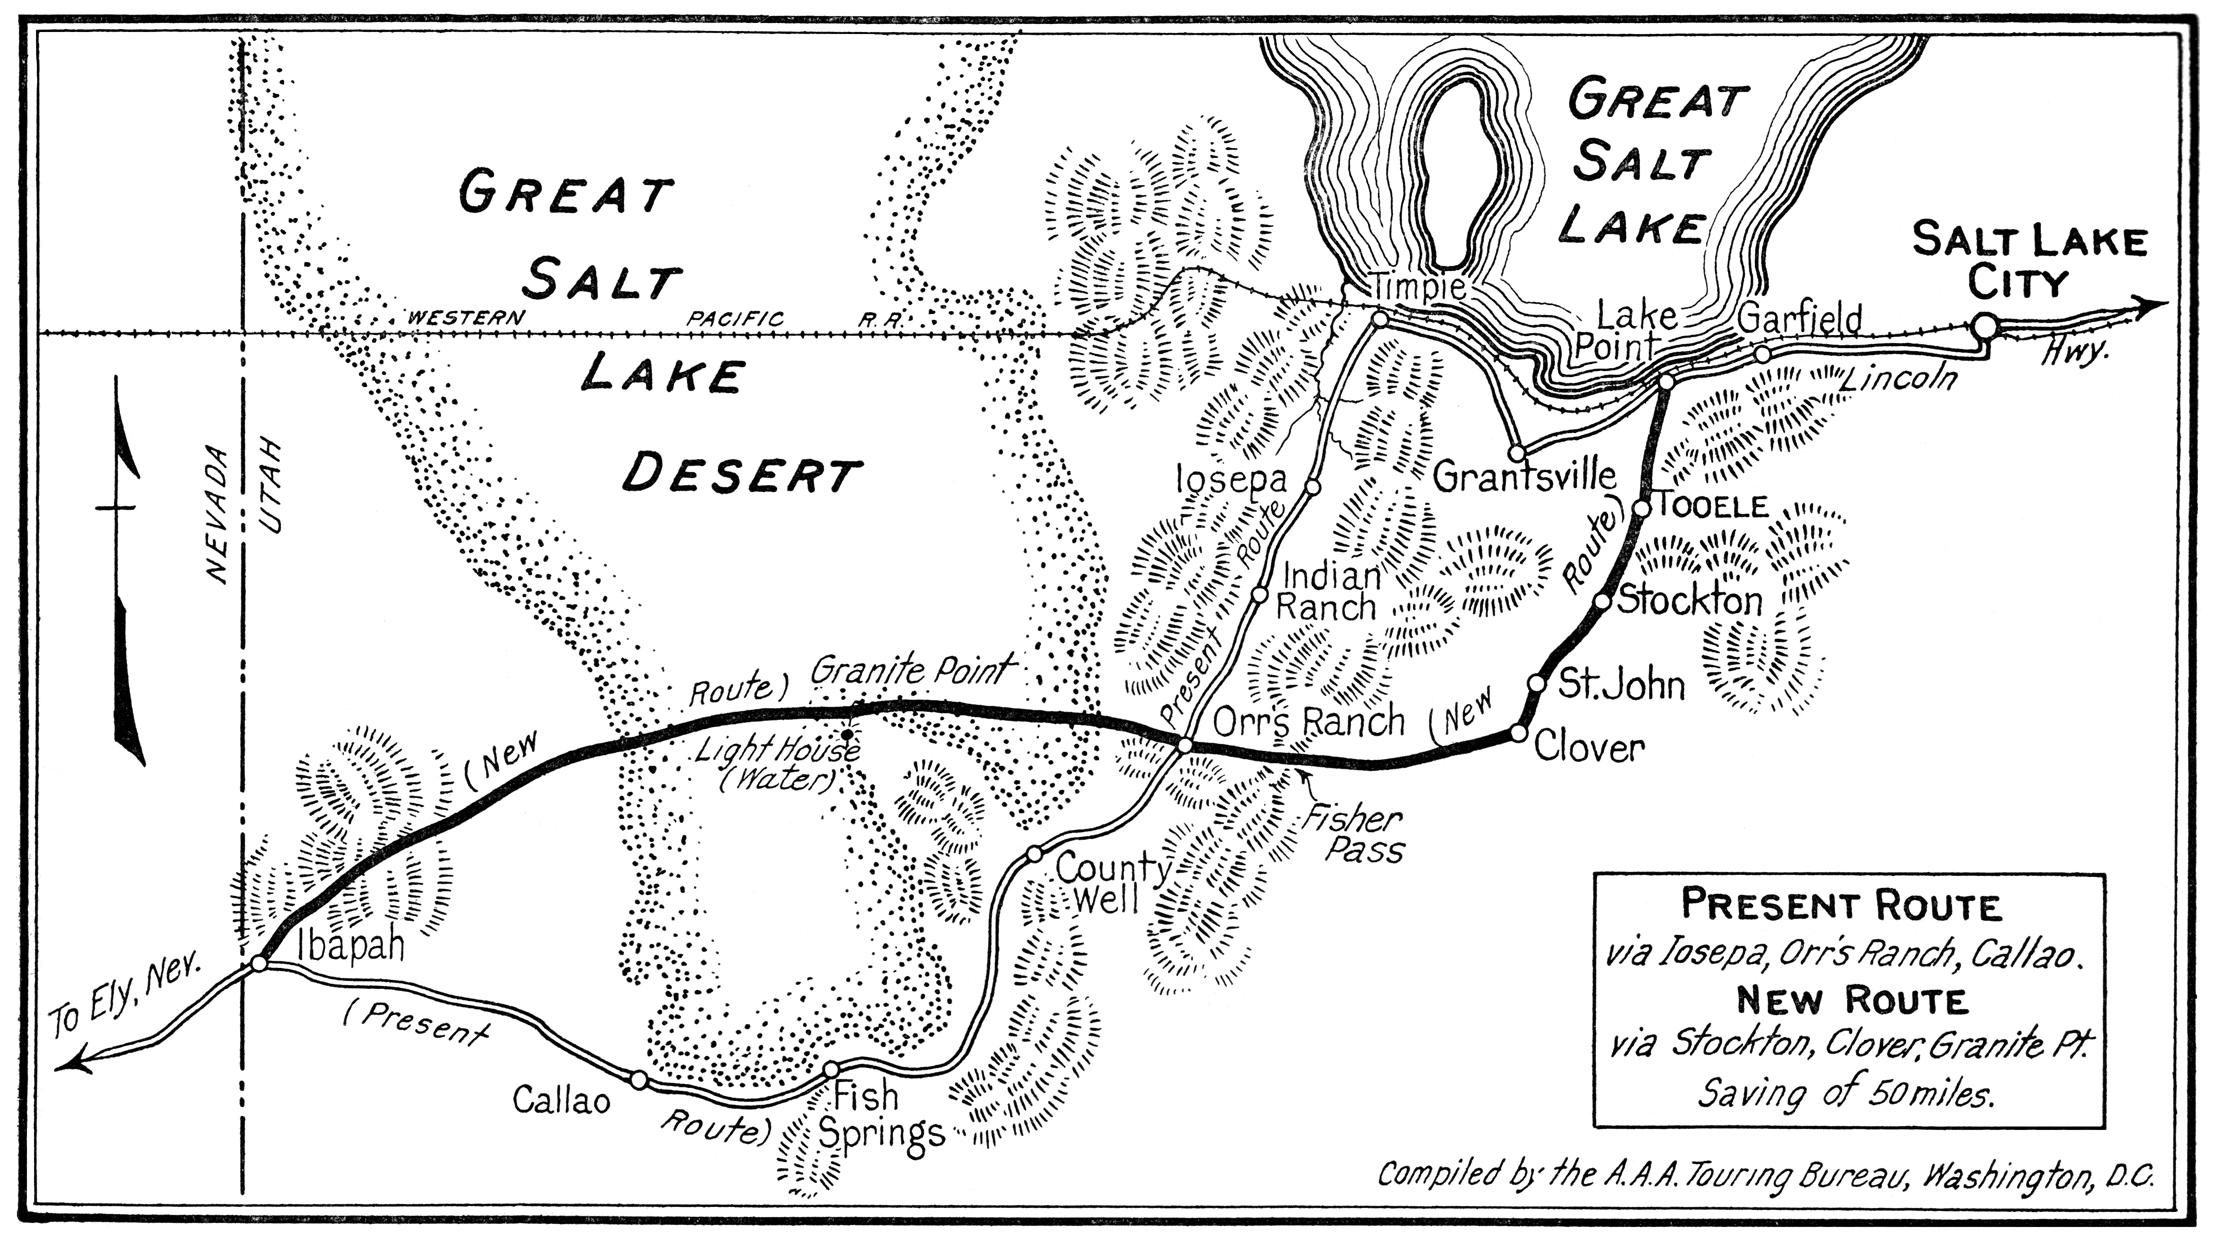 Physical Characteristics Of Great Salt Lake FileGreat Salt Lake